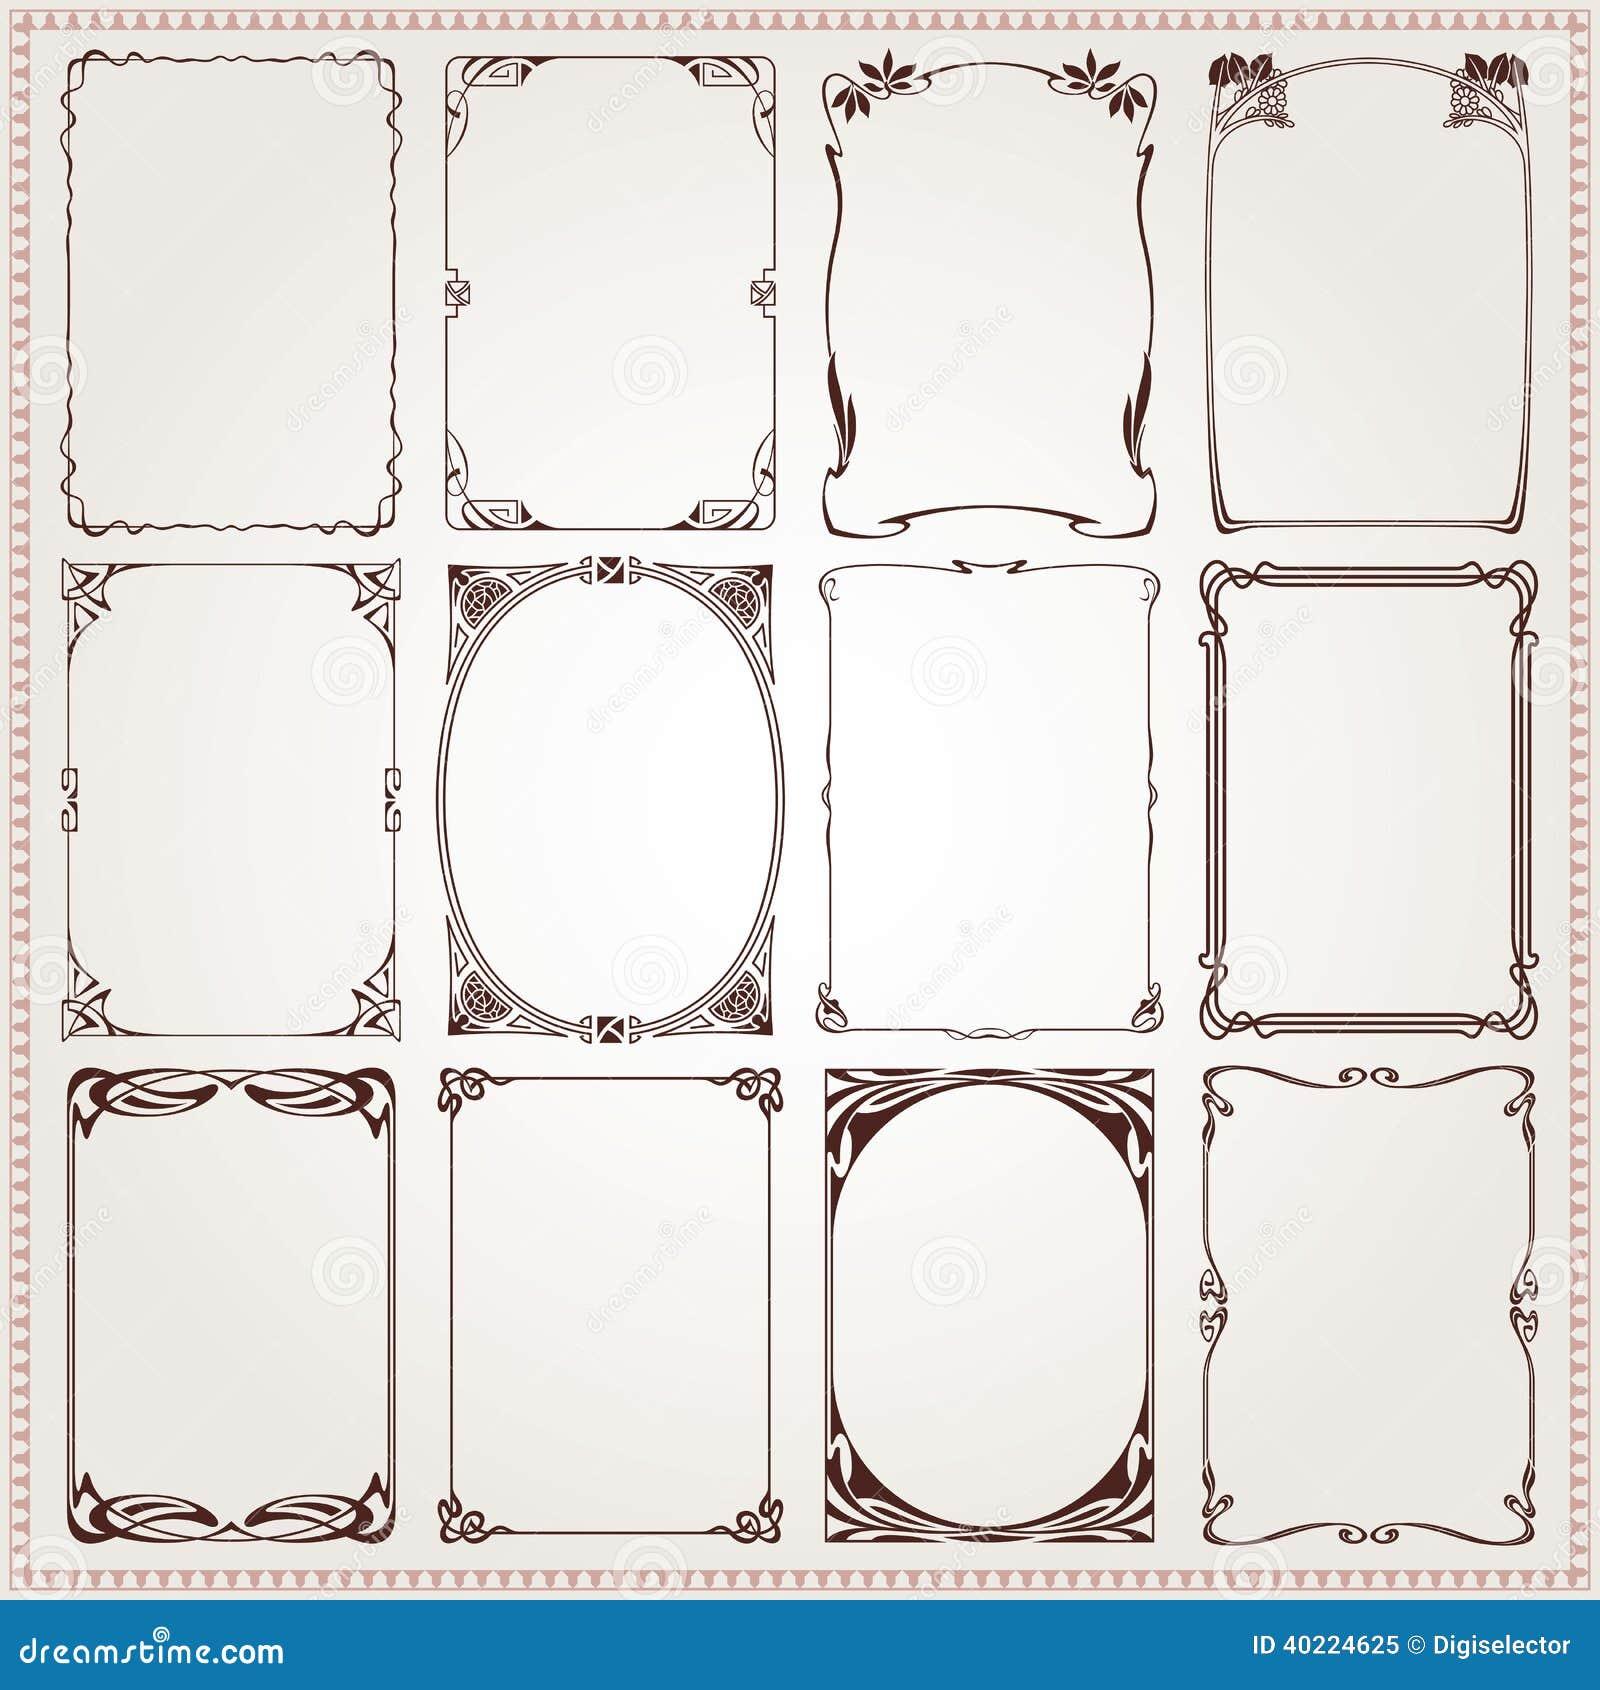 Decorative borders and frames Art Nouveau style vector